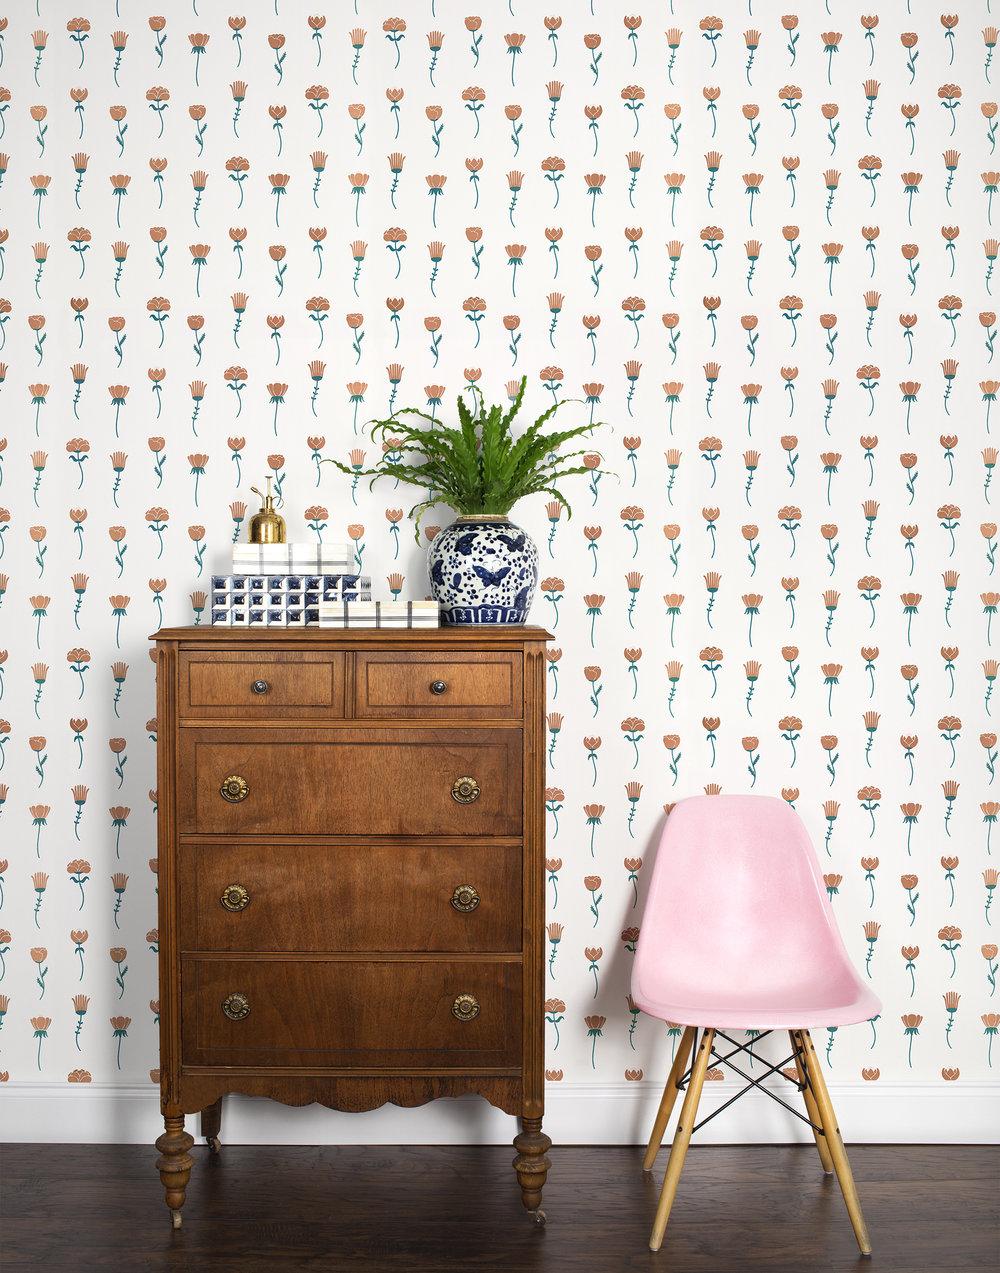 HW_WD015_Margot_Copper_Room_1800pxW.jpg